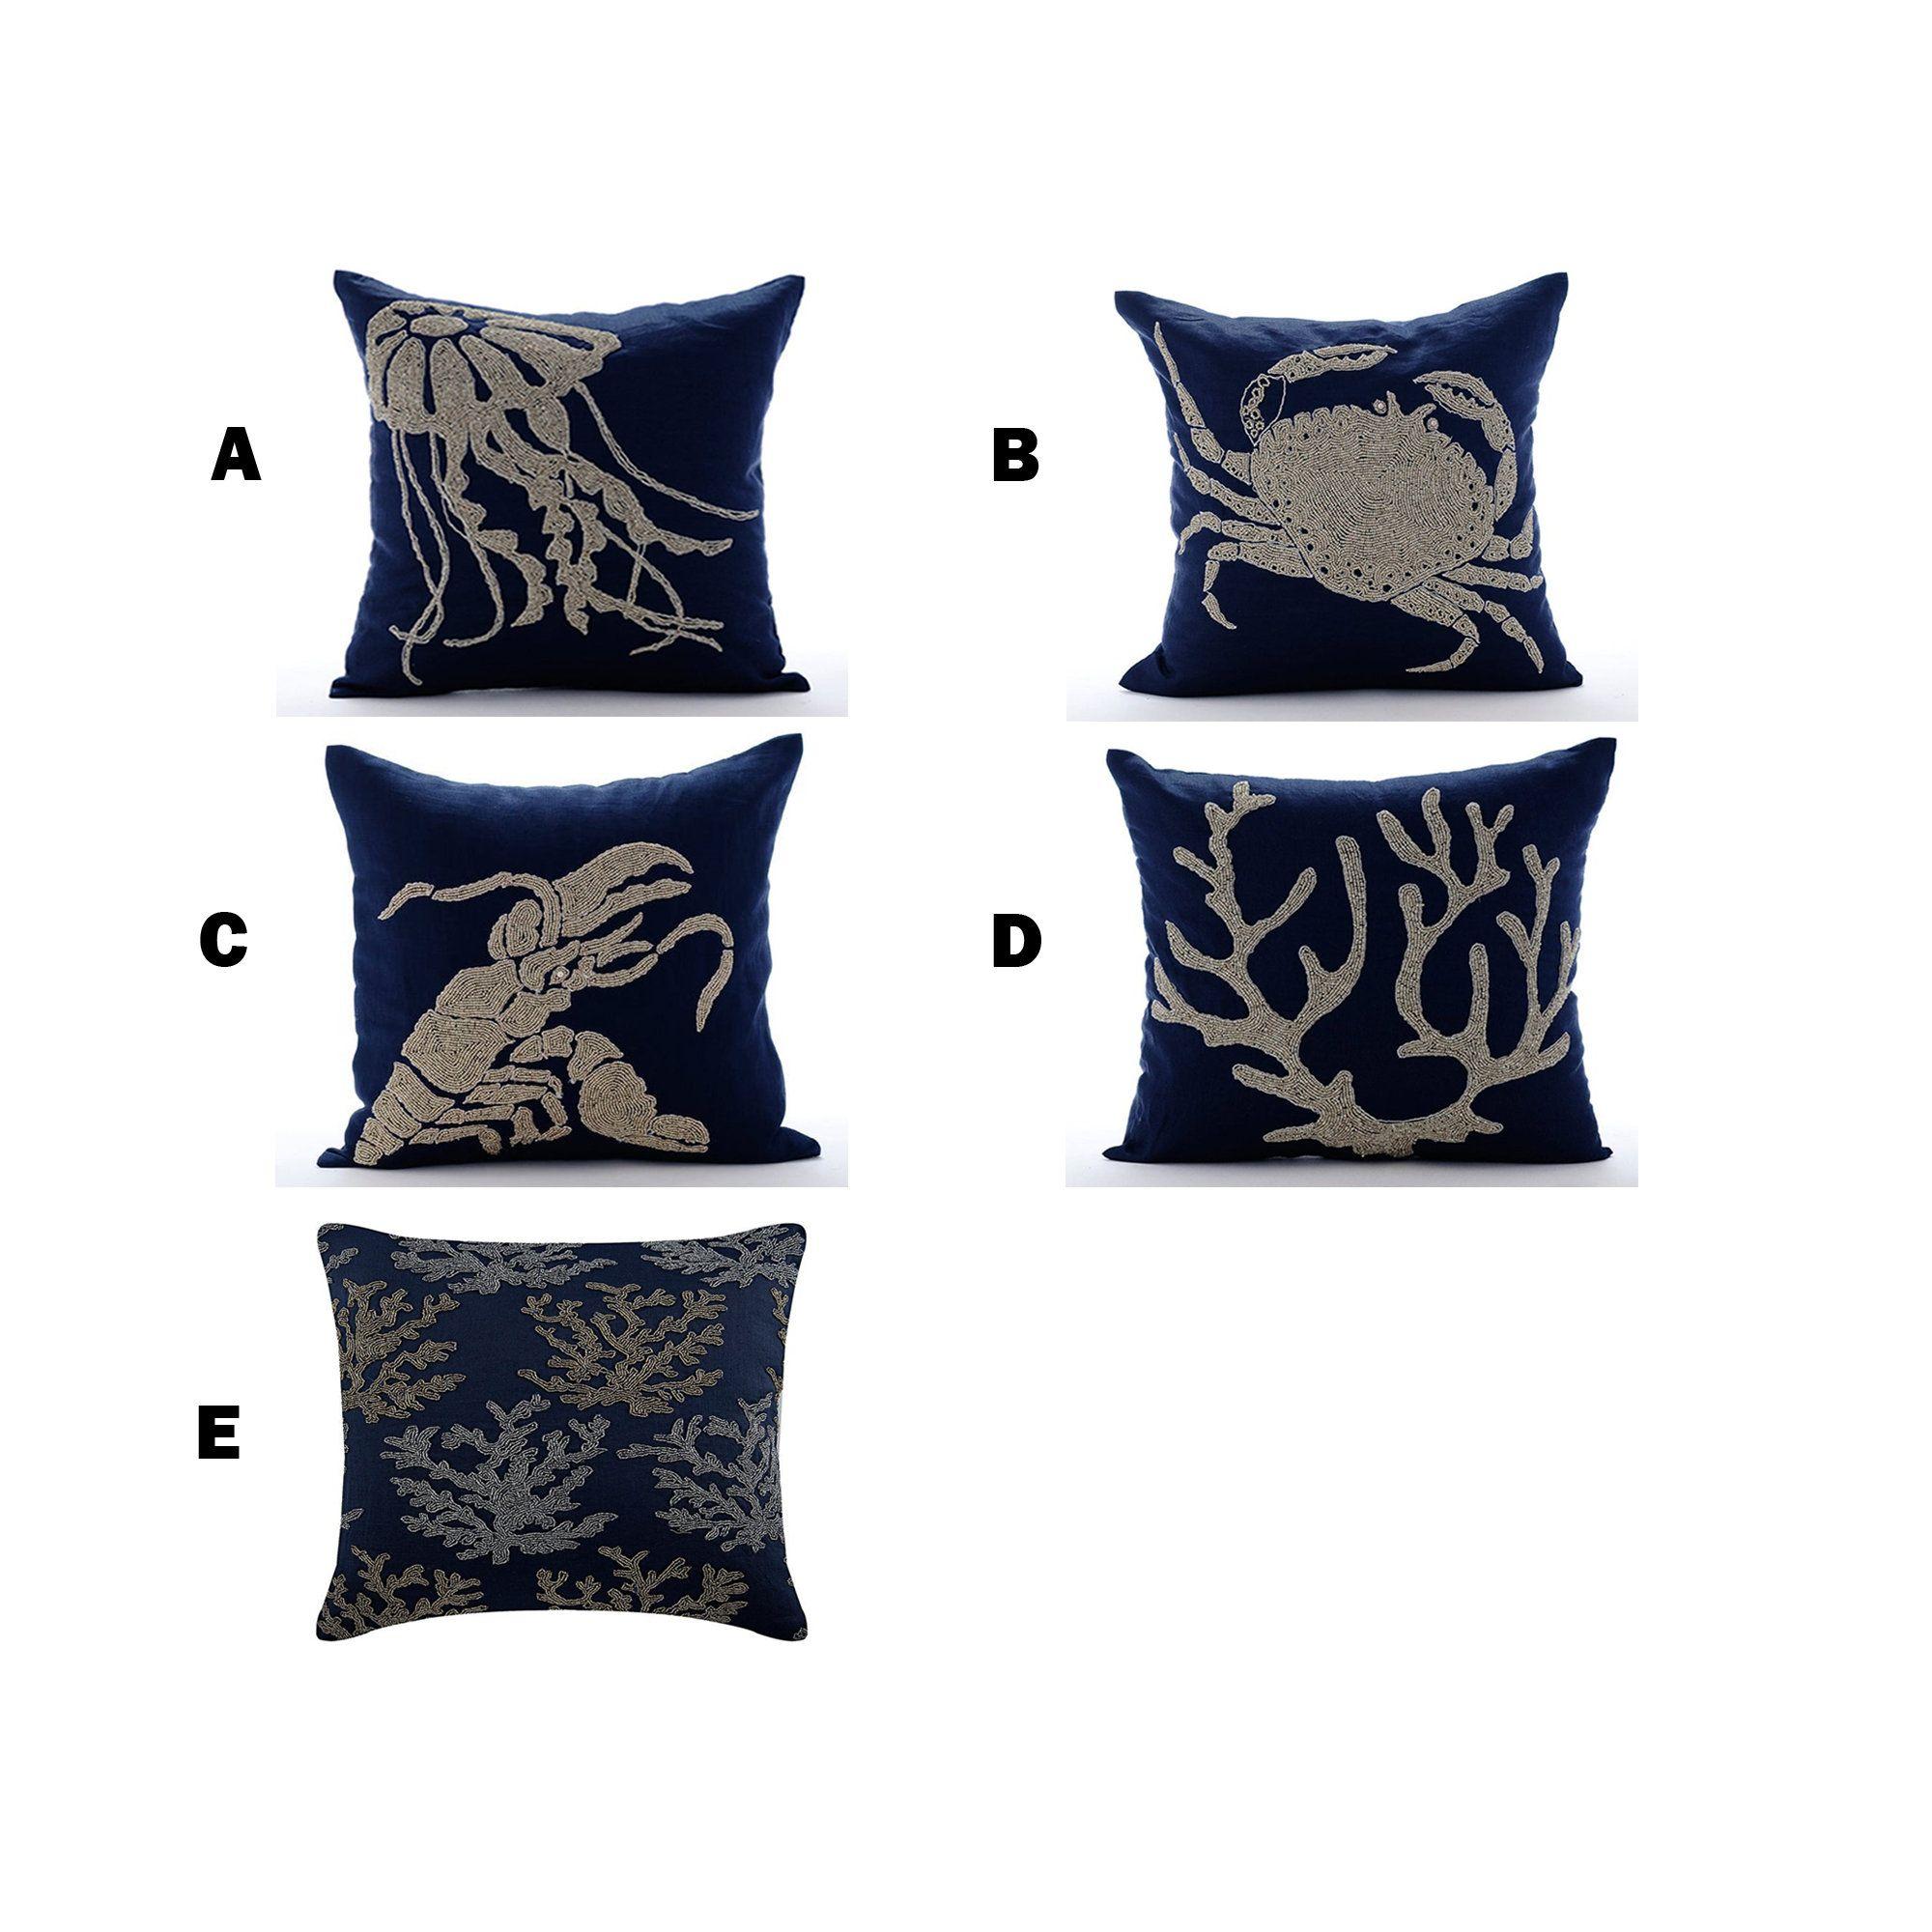 Decorative Throw Pillow Cover Navy Blue Cotton Linen Pillow Etsy In 2020 Throw Pillow Cover Navy Decorative Throw Pillow Covers Navy Blue Throw Pillows